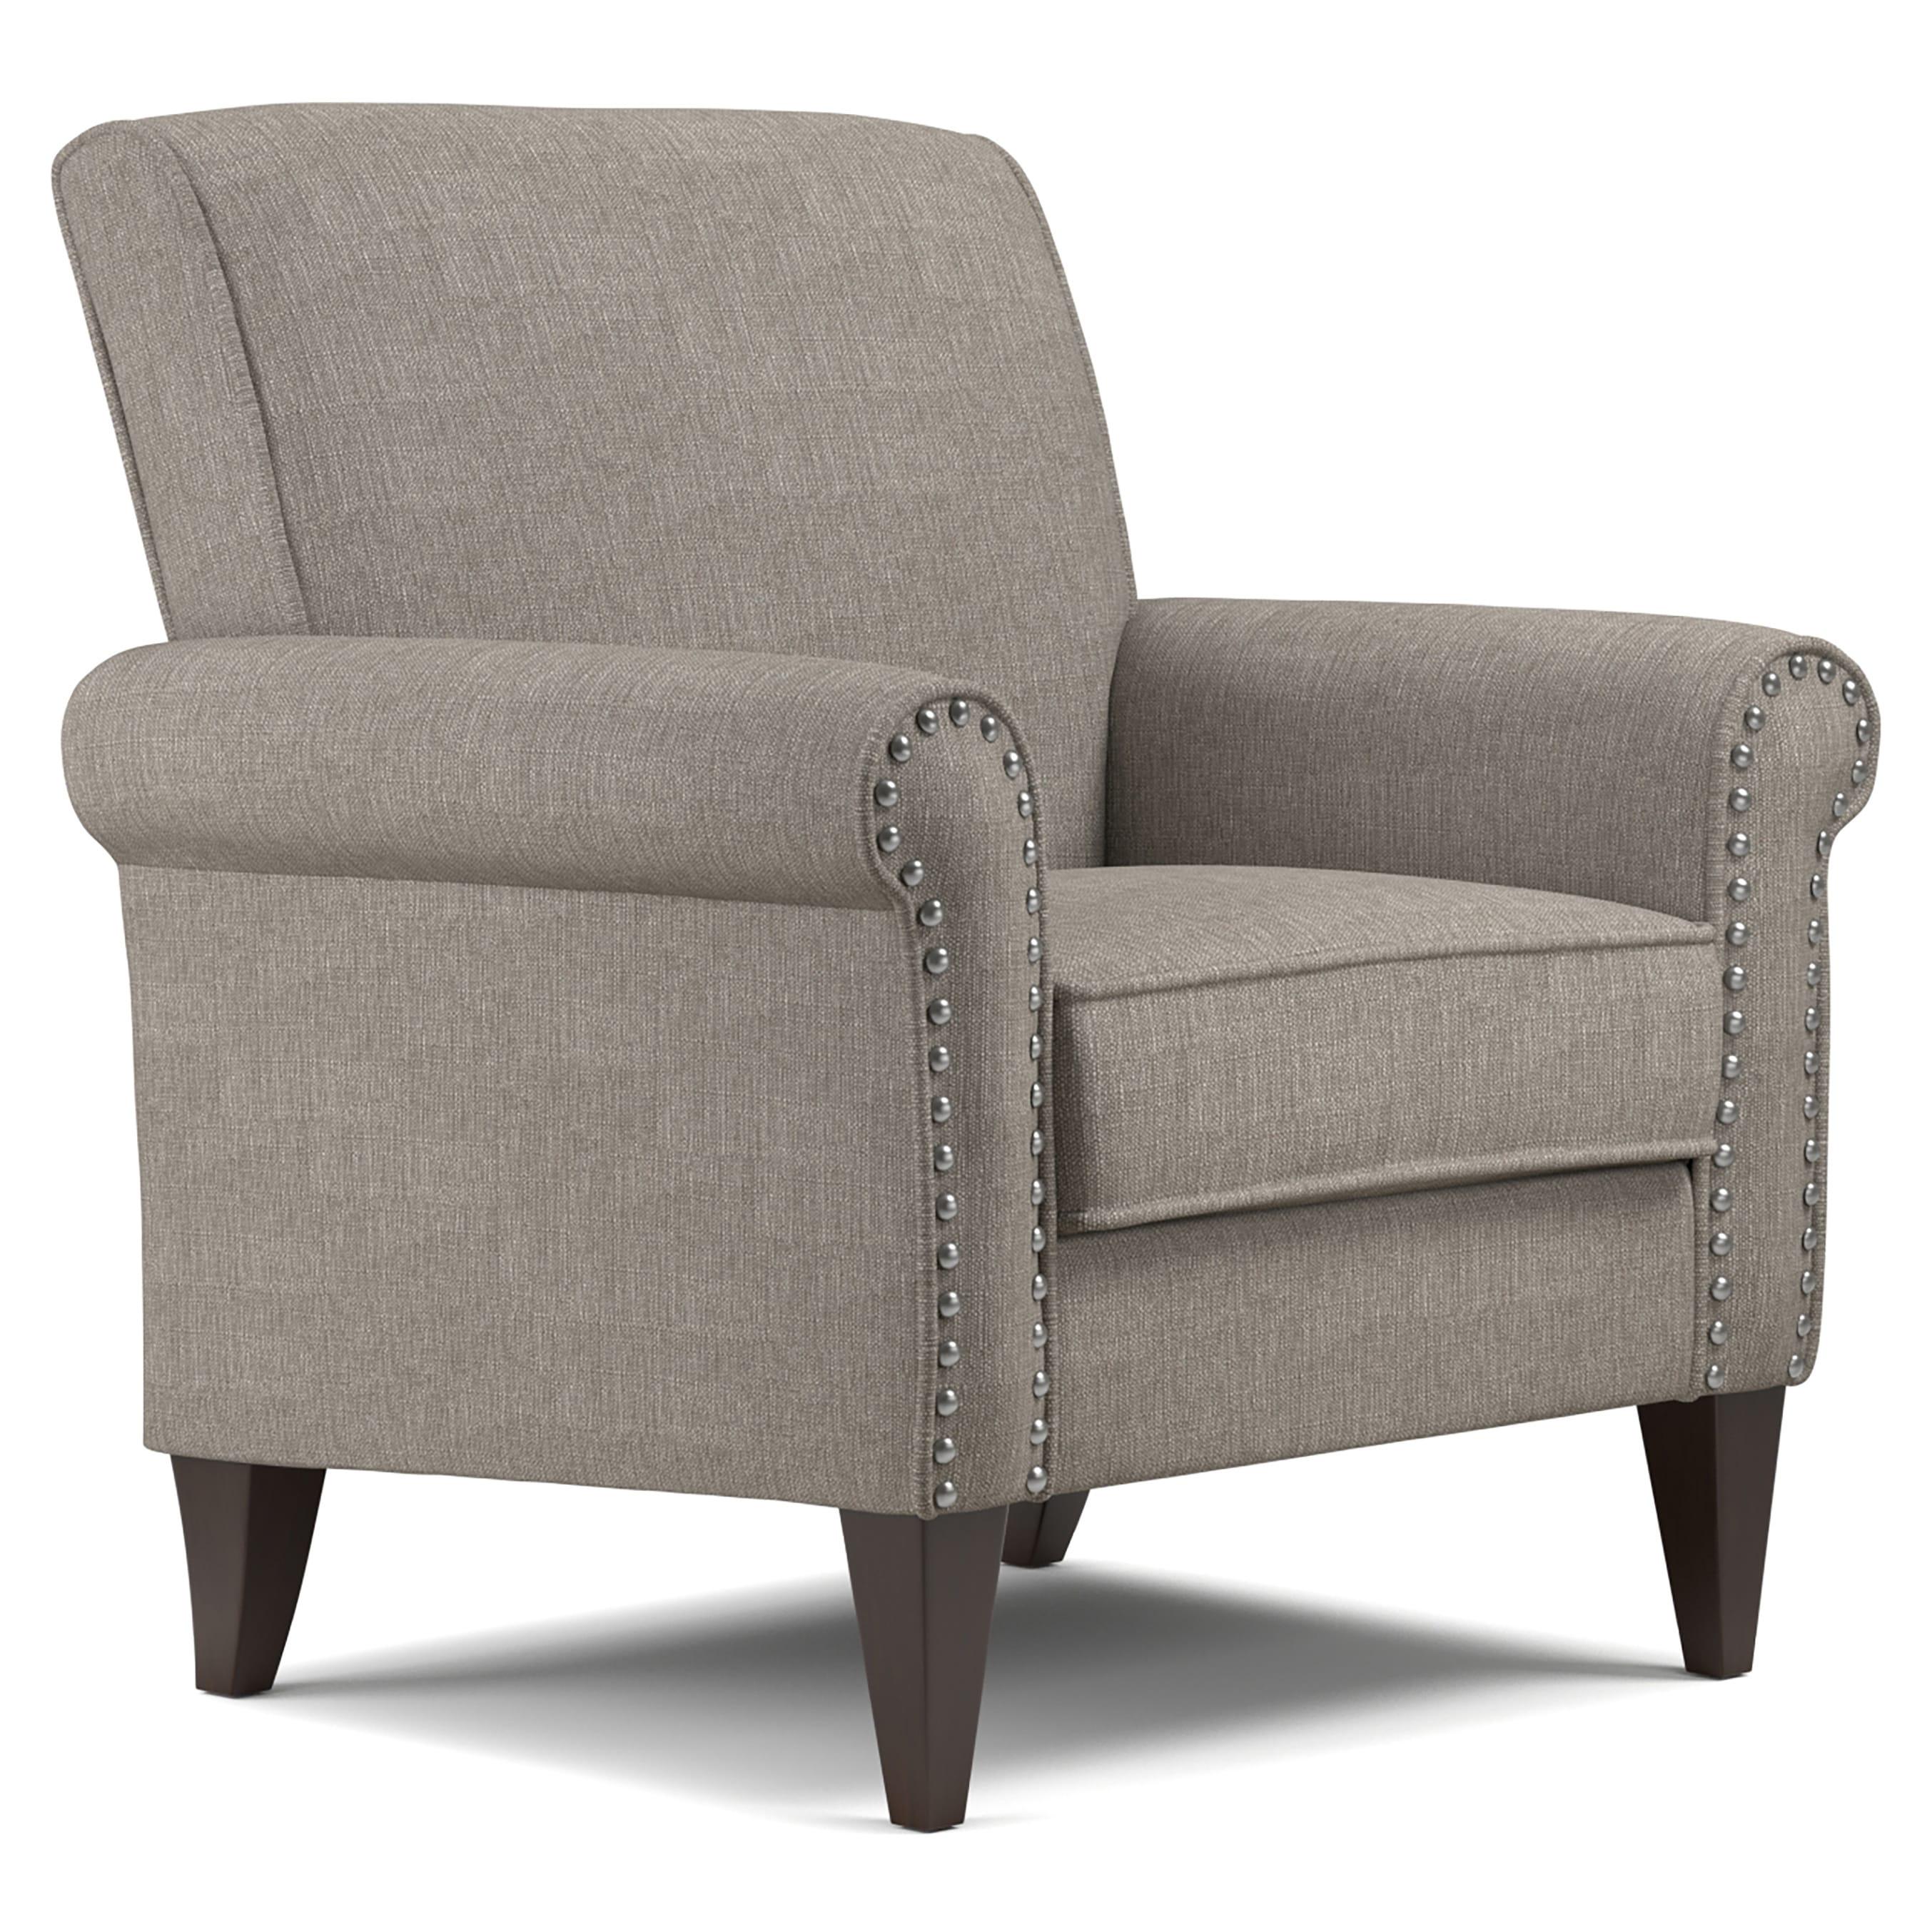 Groovy Accent Chairs Shop Online At Overstock Uwap Interior Chair Design Uwaporg